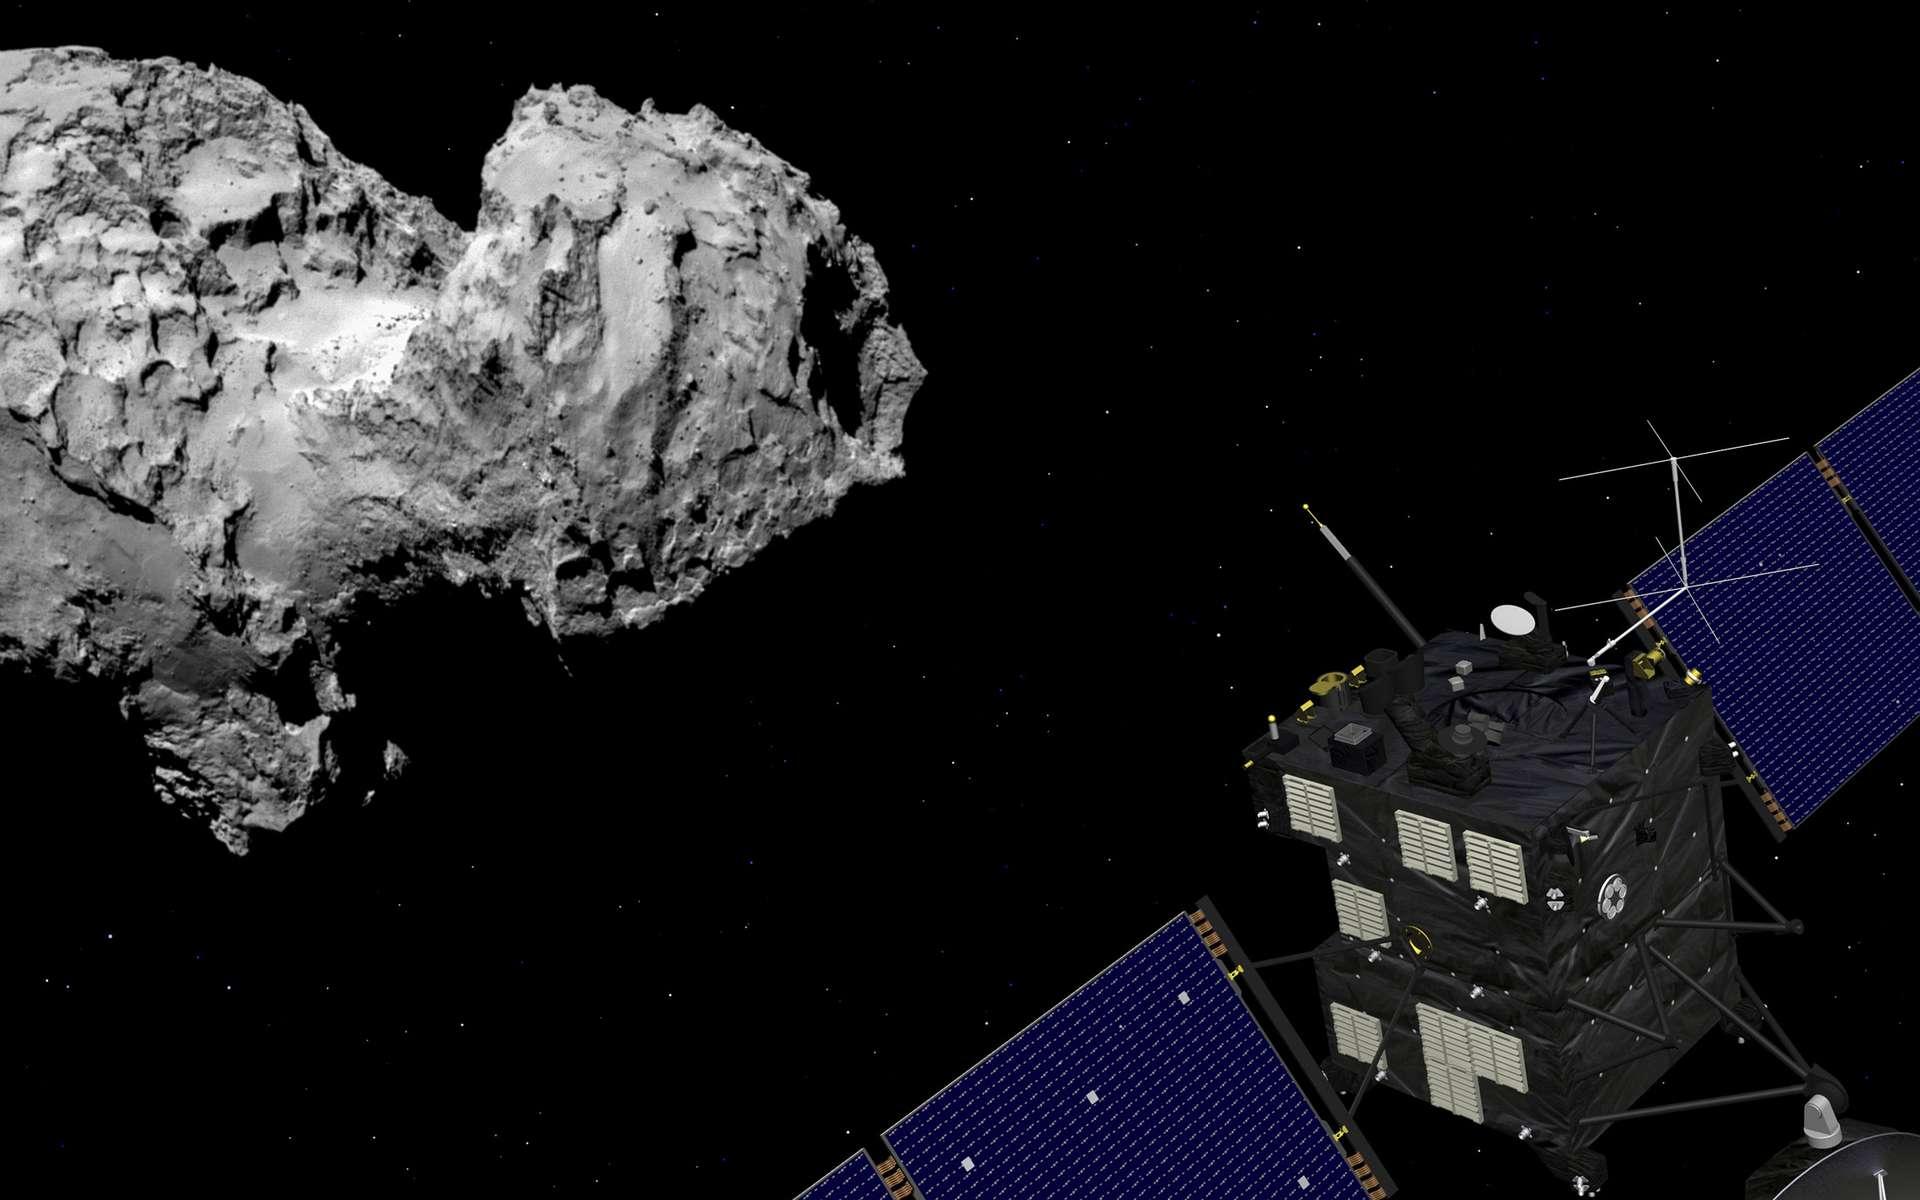 Vue d'artiste de la sonde Rosetta et de la comète Churyumov-Gerasimenko, alias Tchouri. © Rosetta : Esa–J. Huart, 2014 ; Comète : Esa, Rosetta, MPS for Osiris Team